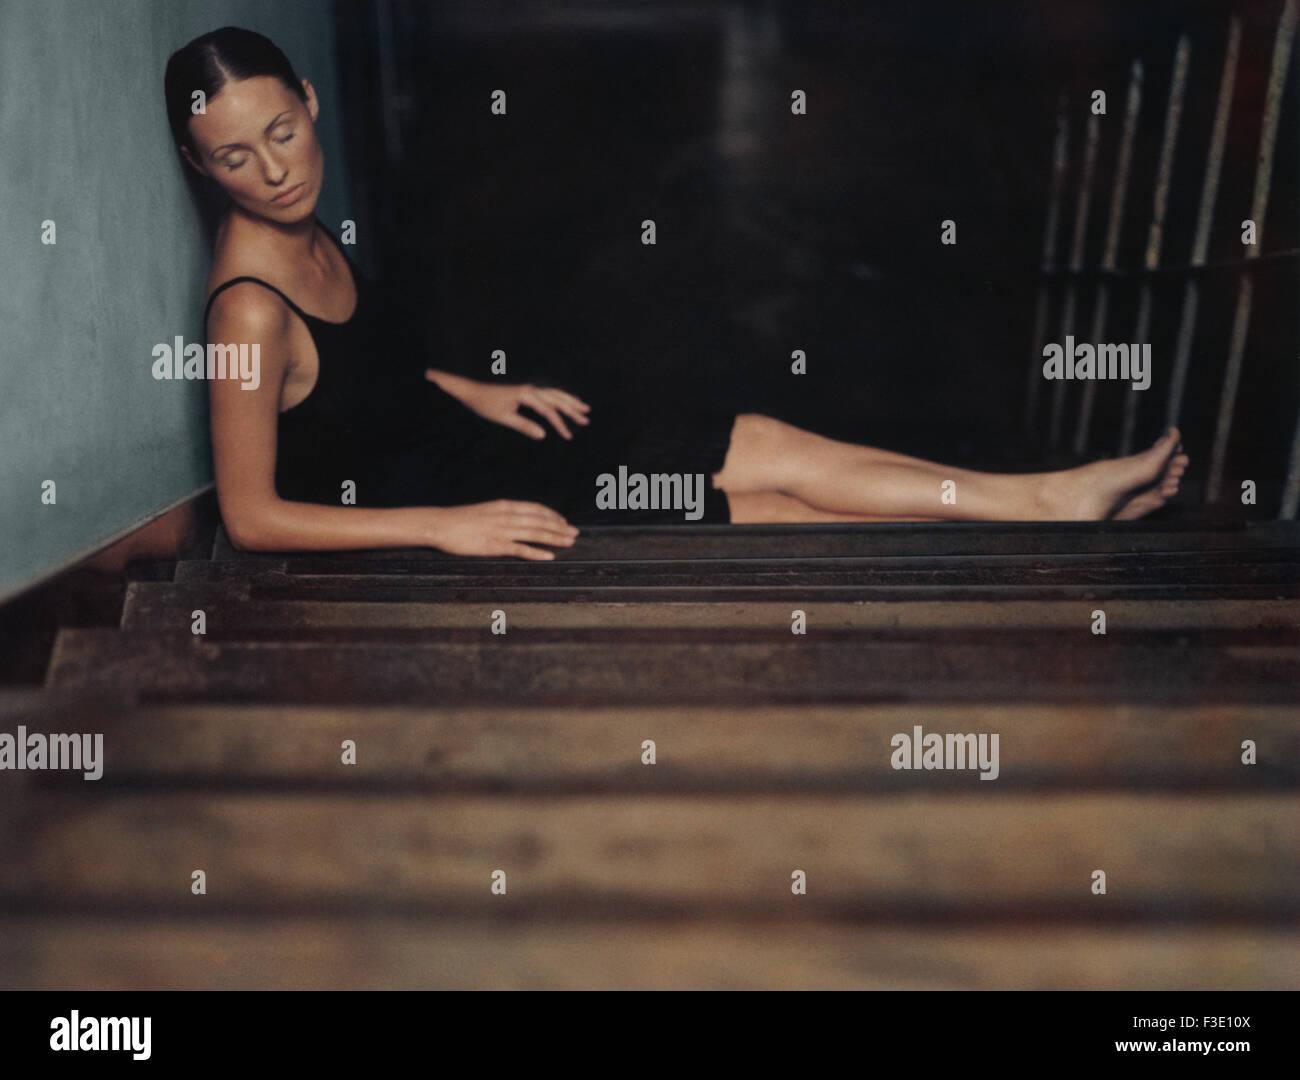 Woman sleeping on stairs - Stock Image